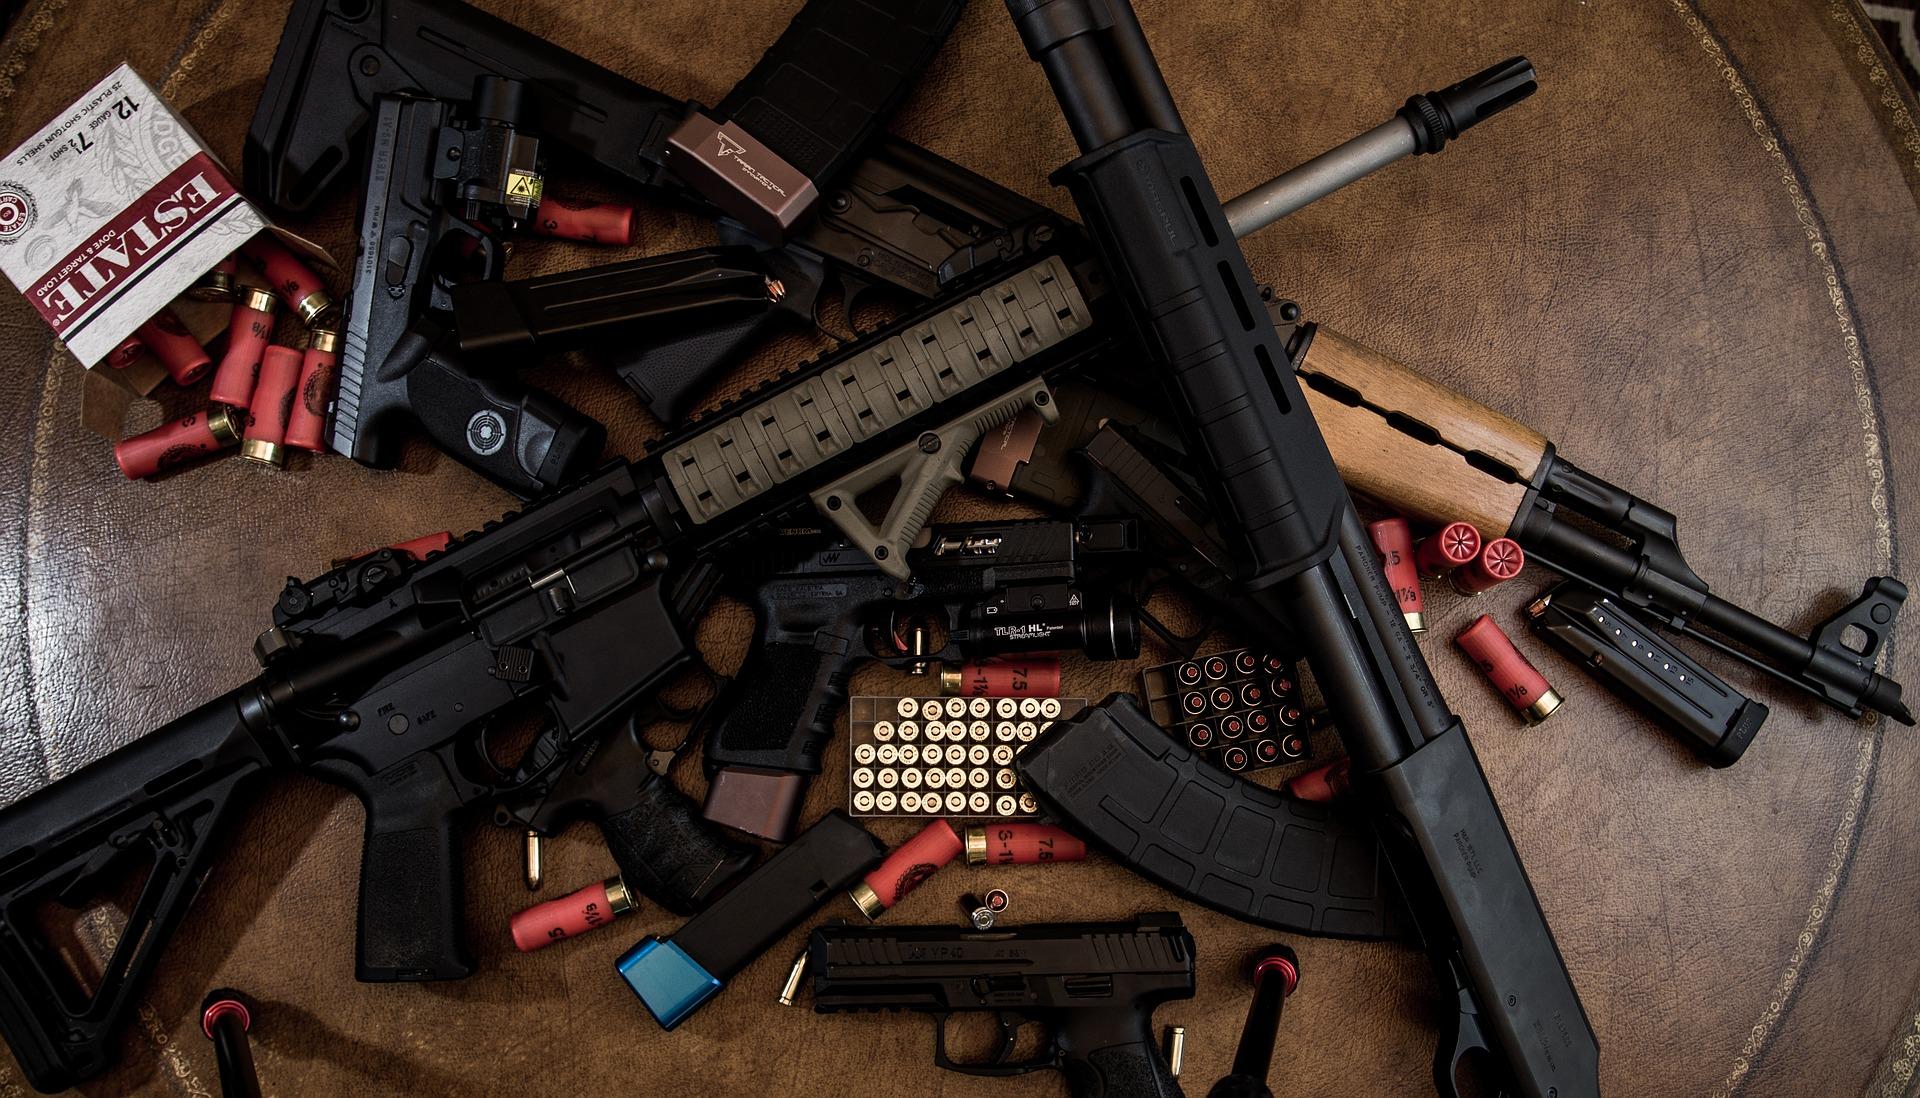 Evil, guns, and mental health